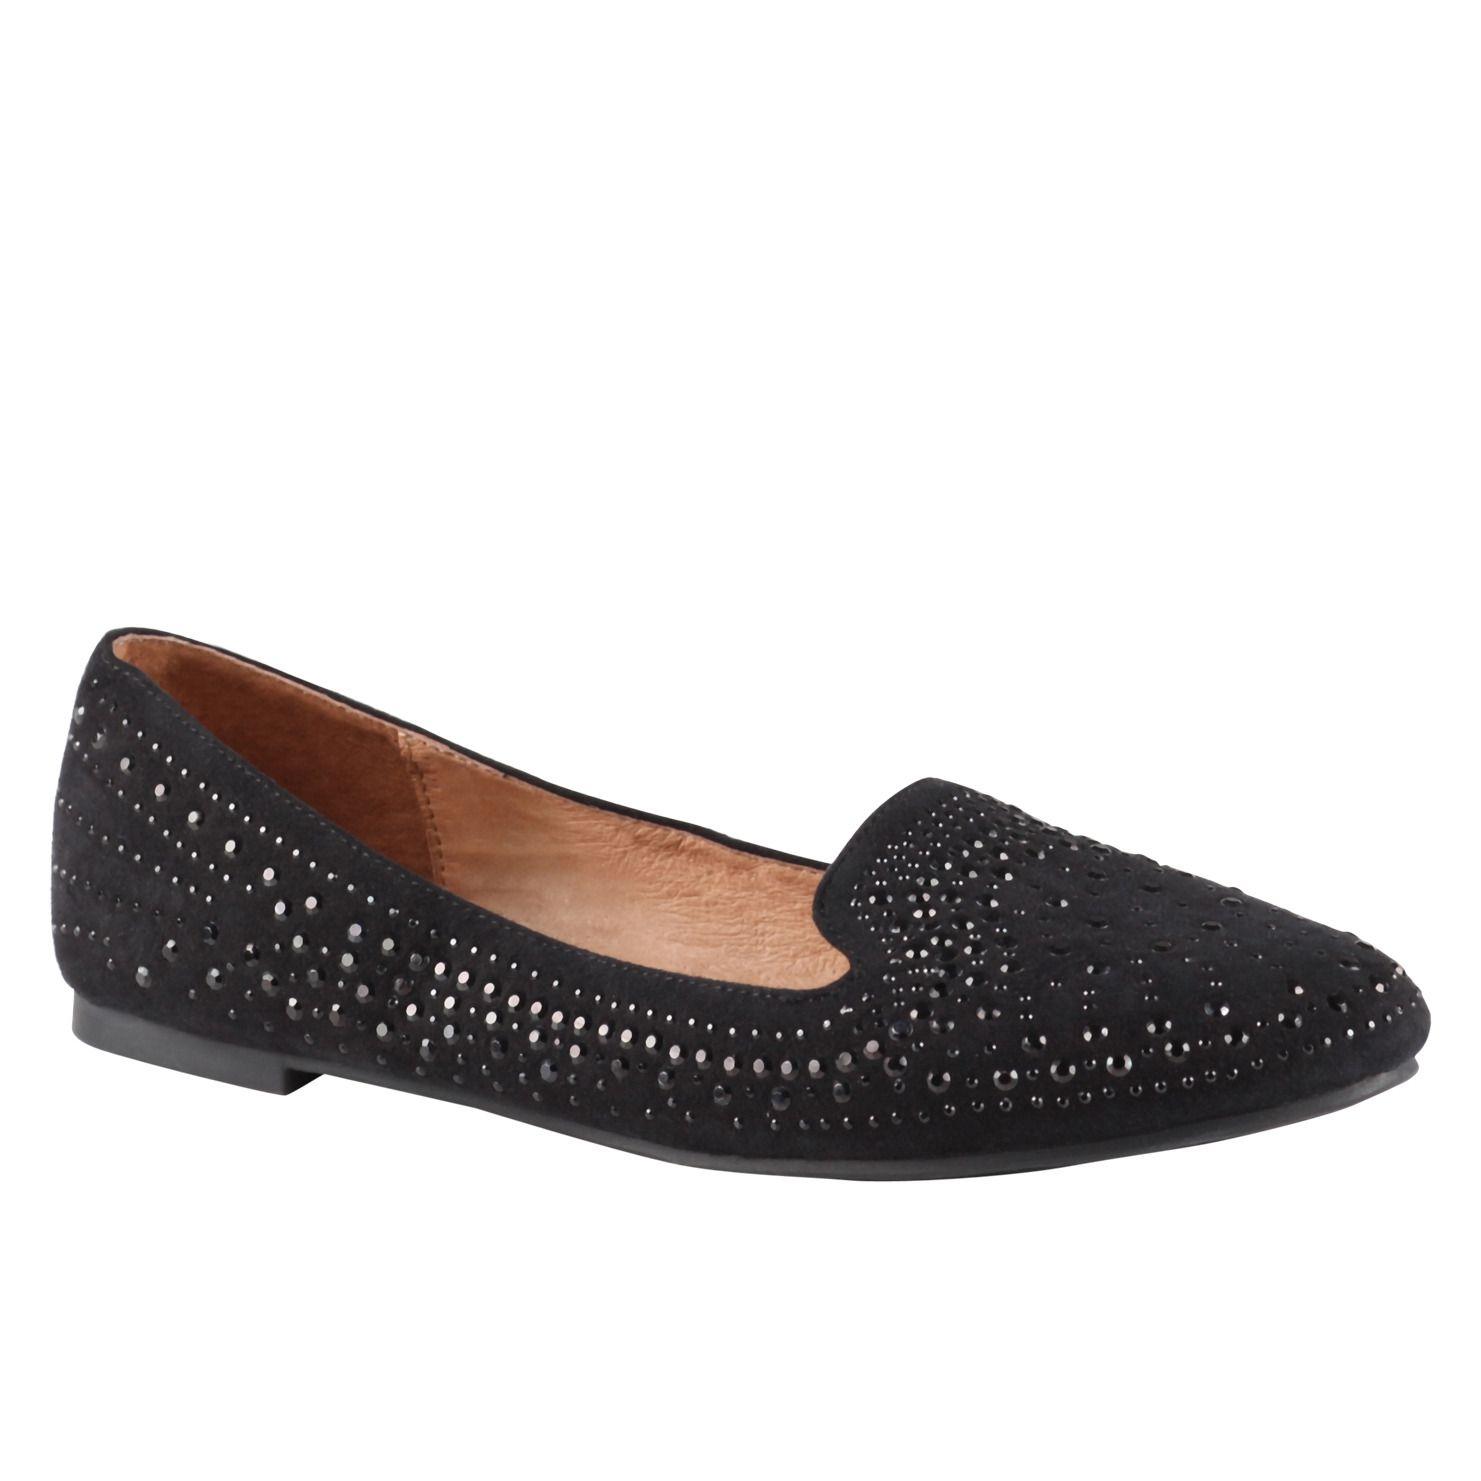 e911dda56 MITHELL - women's flats shoes for sale at ALDO Shoes.   Shoes   Aldo ...